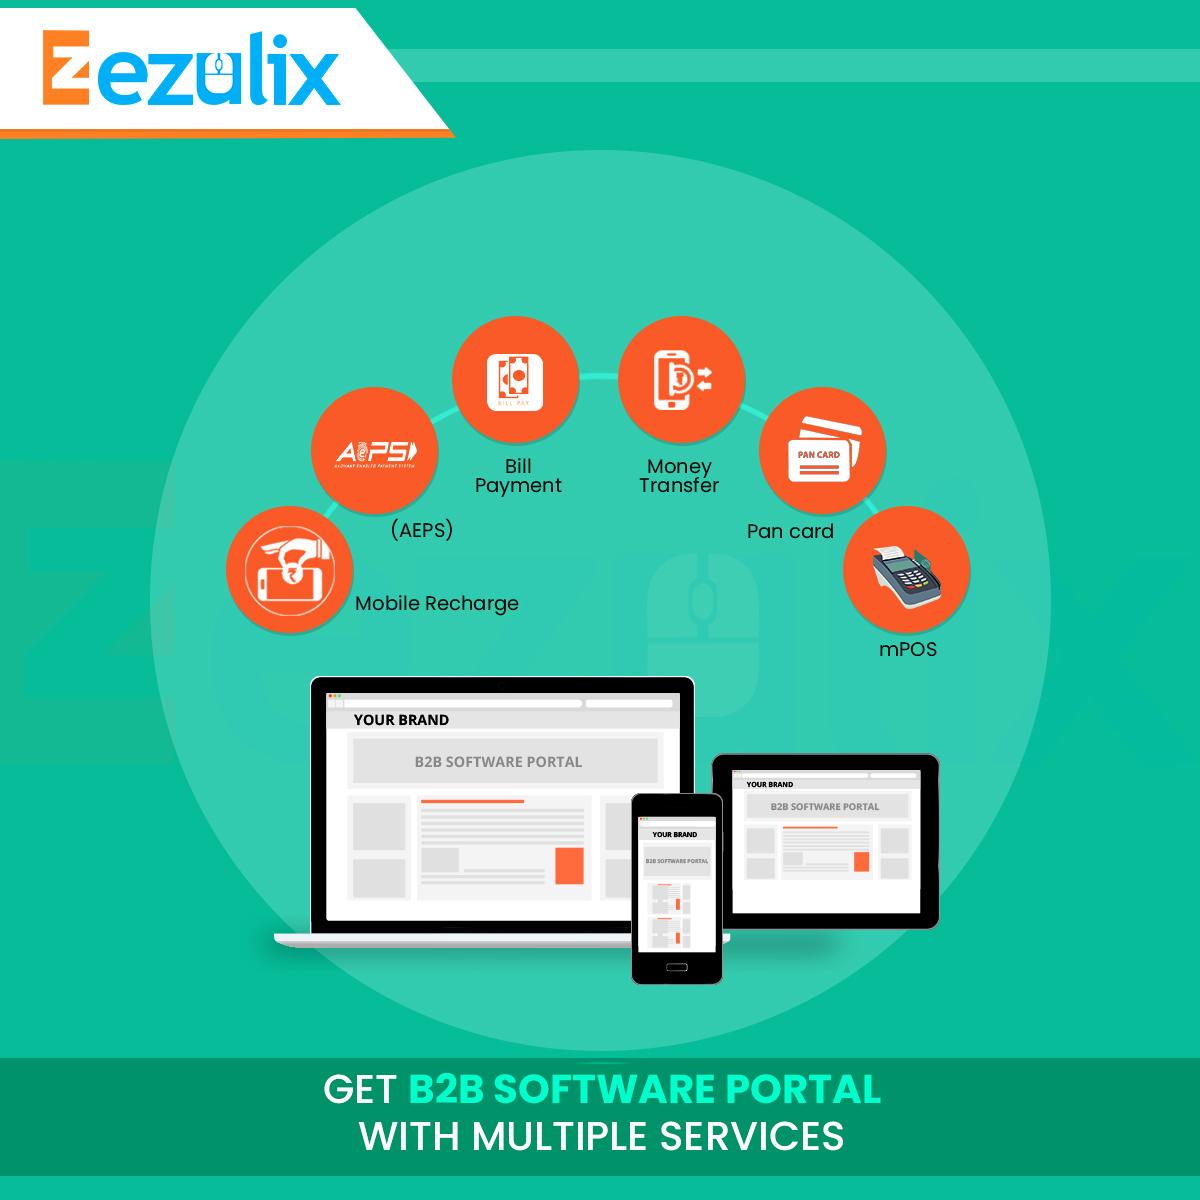 Ezulix - Web Design and Mobile App Development: b2b software